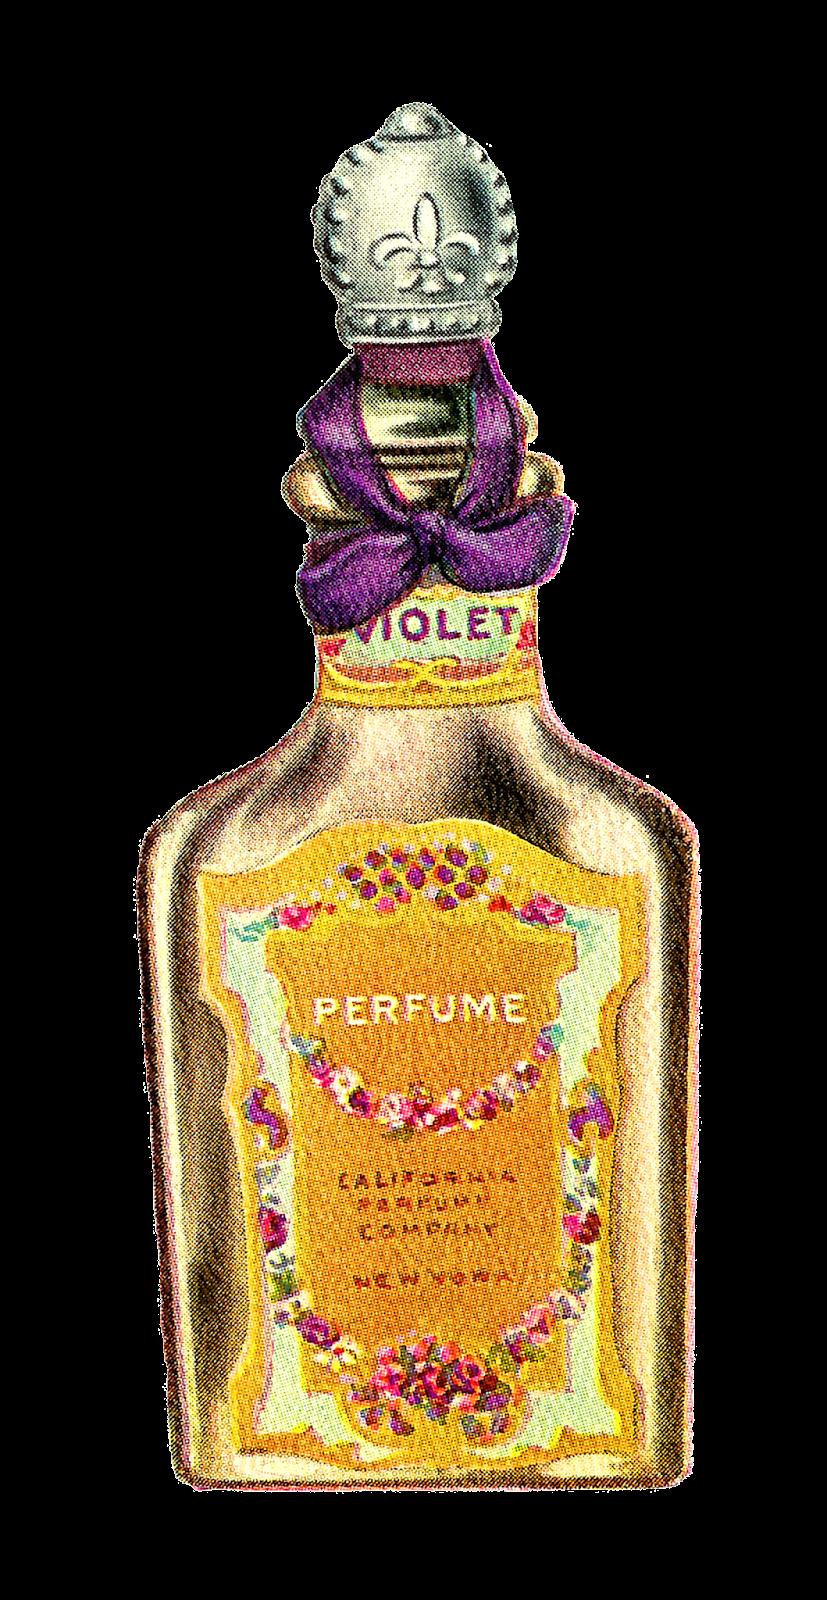 Antique Images Vintage Avon Perfume Bottle Artwork